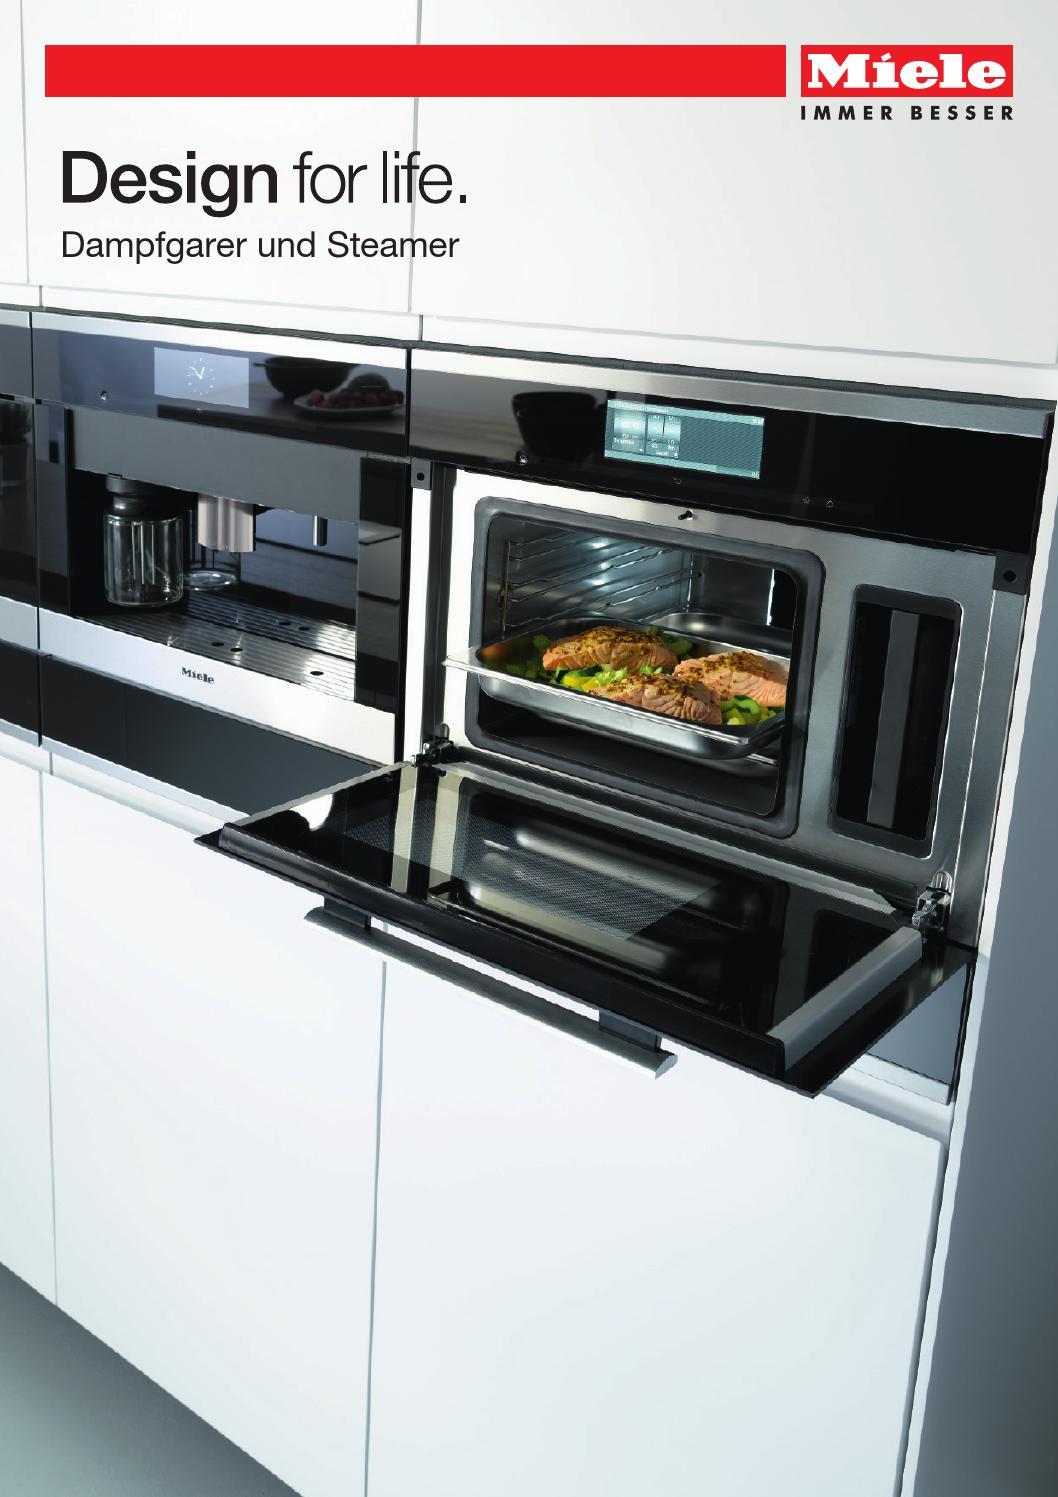 miele produktkatalog dampfgarer und steamer ch de by miele issuu. Black Bedroom Furniture Sets. Home Design Ideas